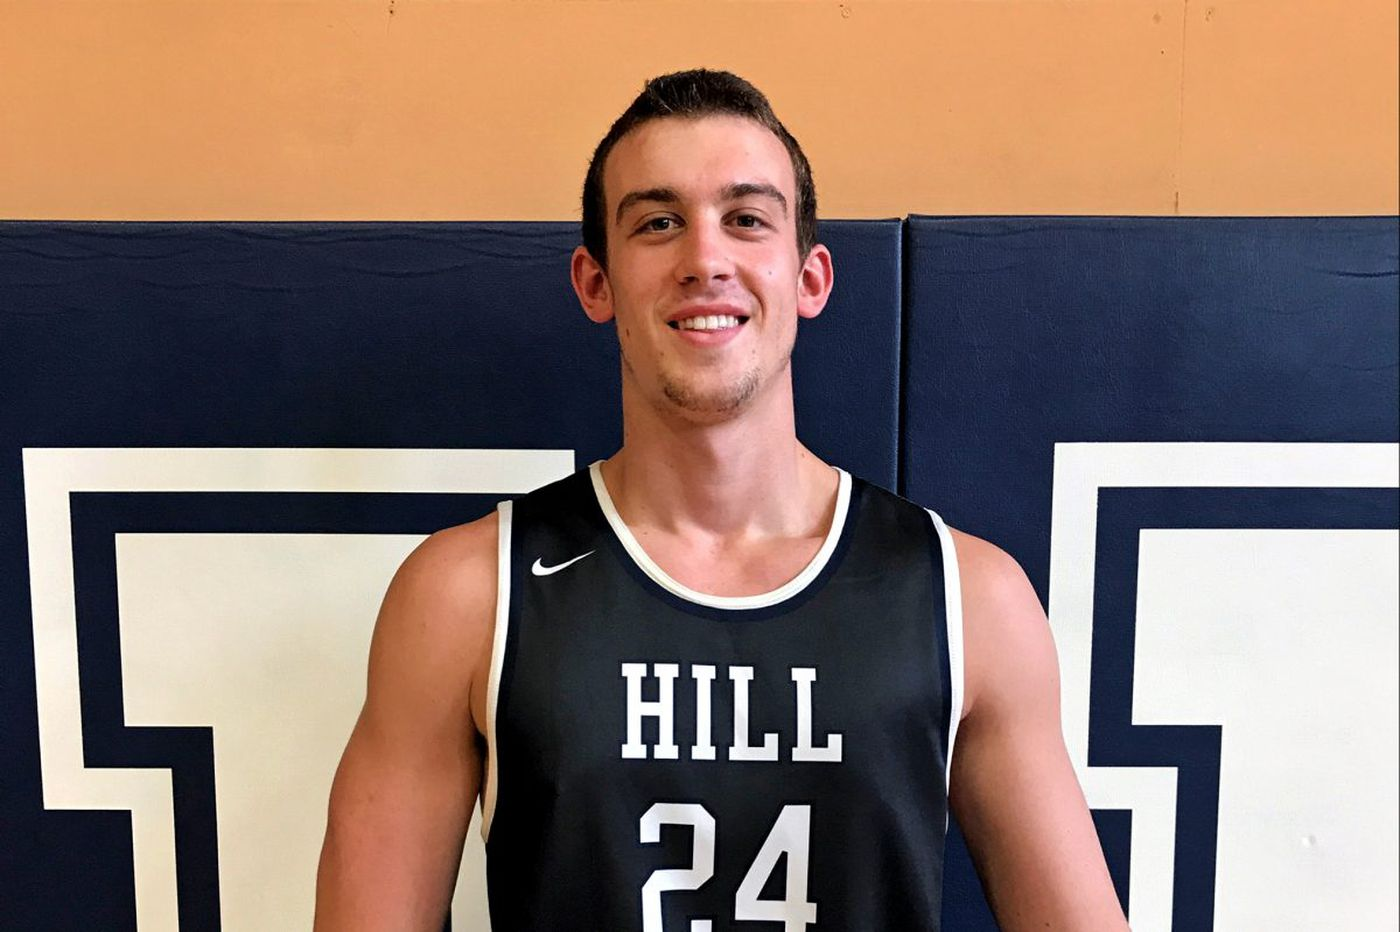 Nick Alikakos taking next basketball step at Hill School